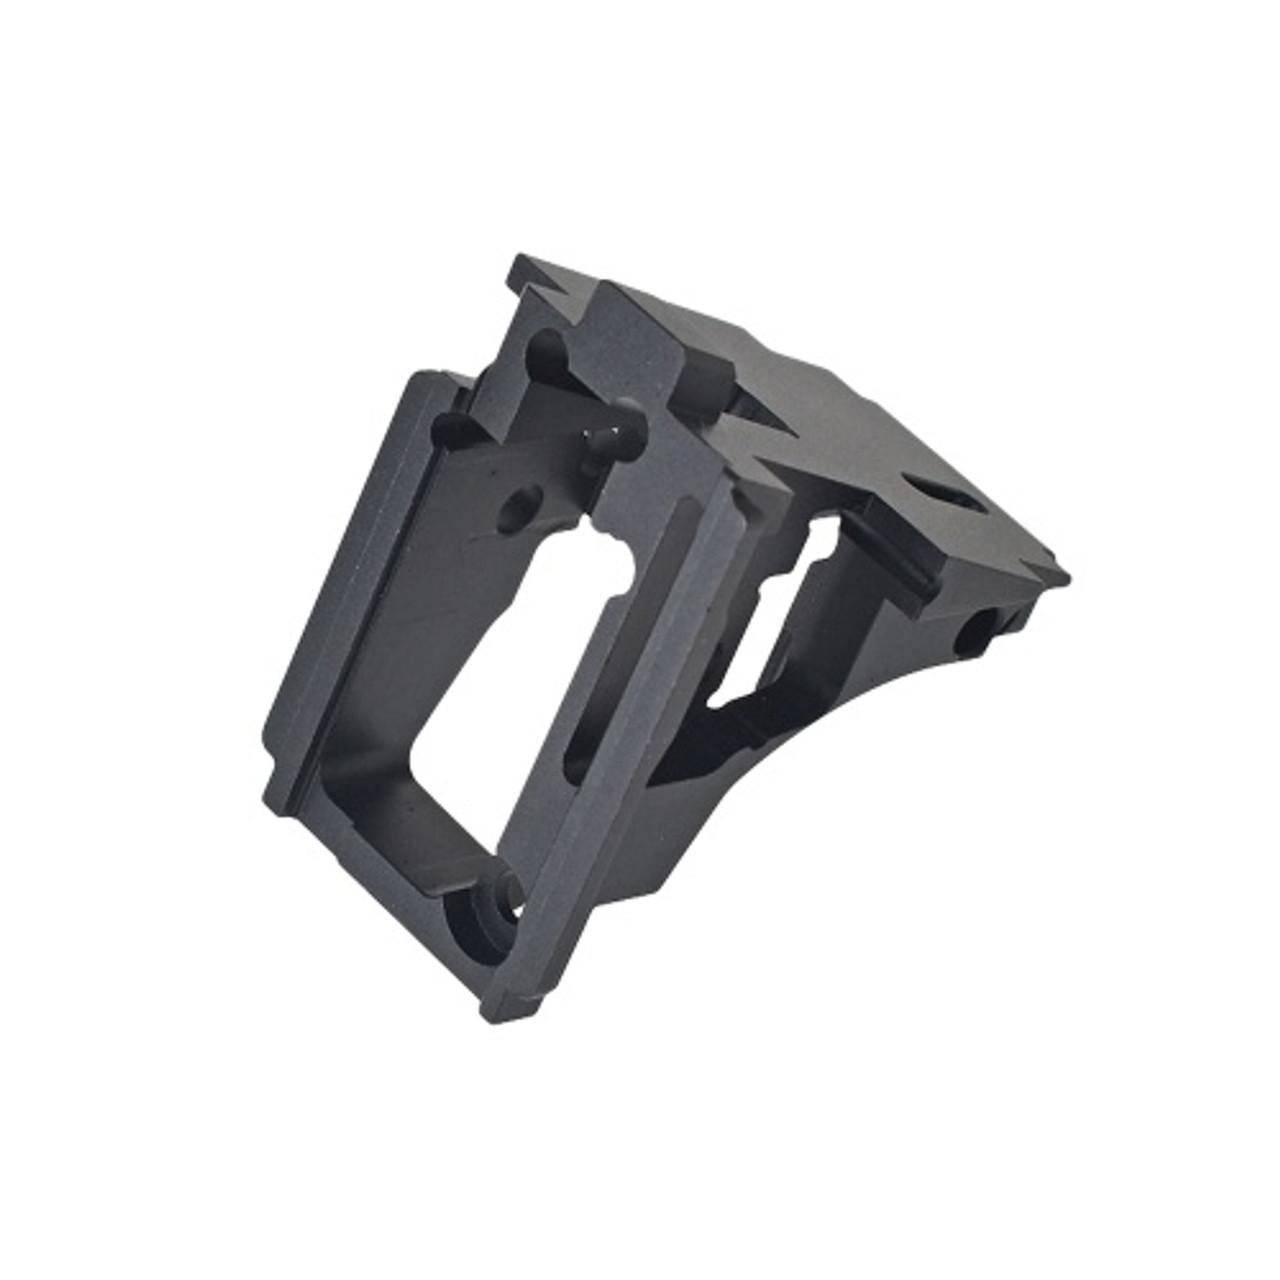 CowCow Technology - Enhanced Hammer Housing (For Marui G17/19/22/34)